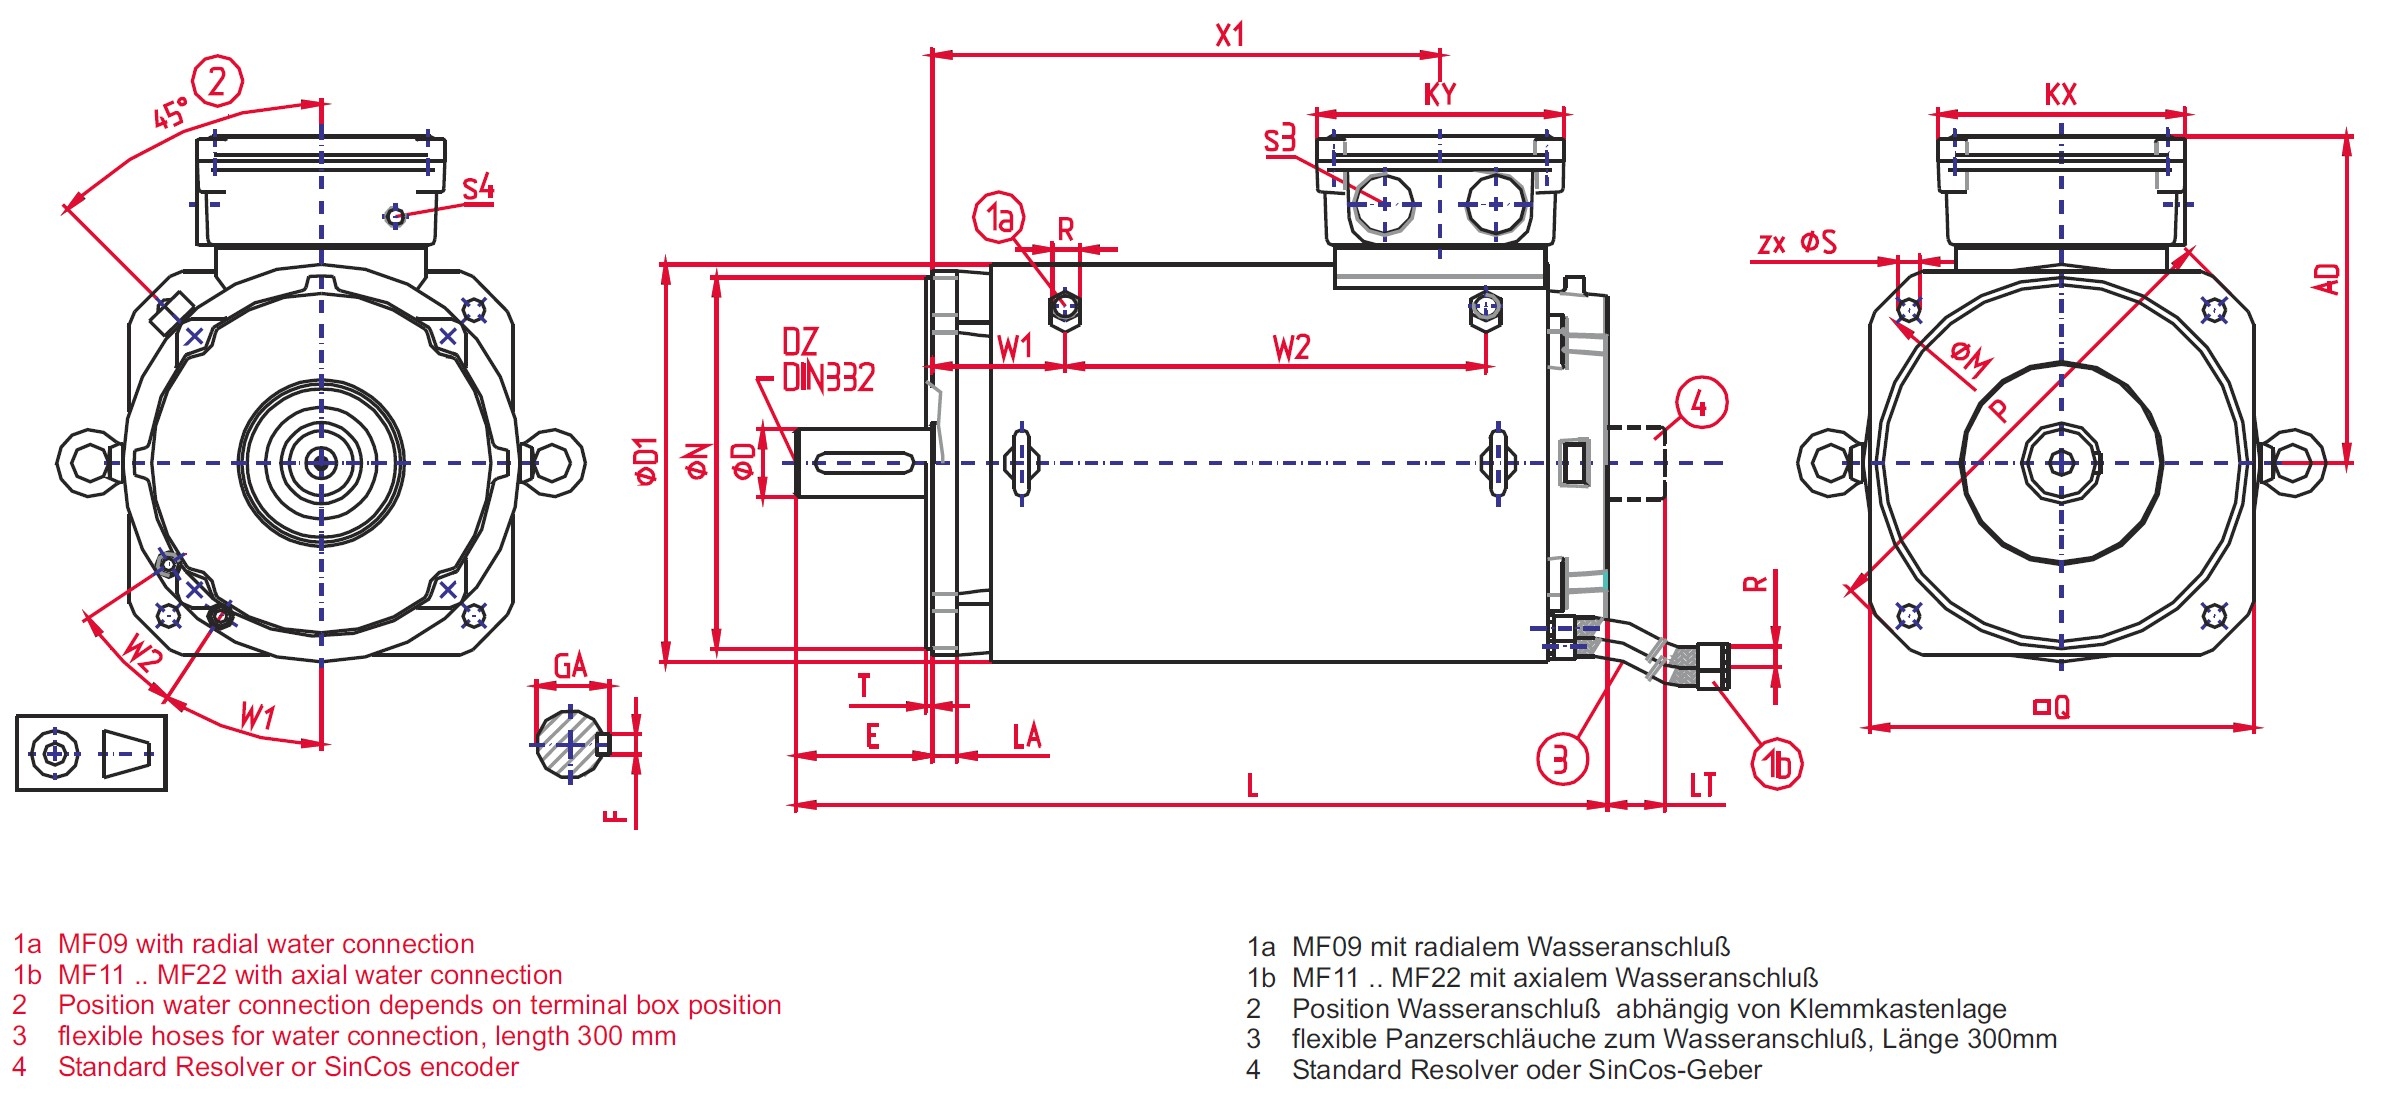 3 Phase Motor Wiring Diagram Electric Baldor To Dayton Oswald Mf Synchronous Motors Ponents Of